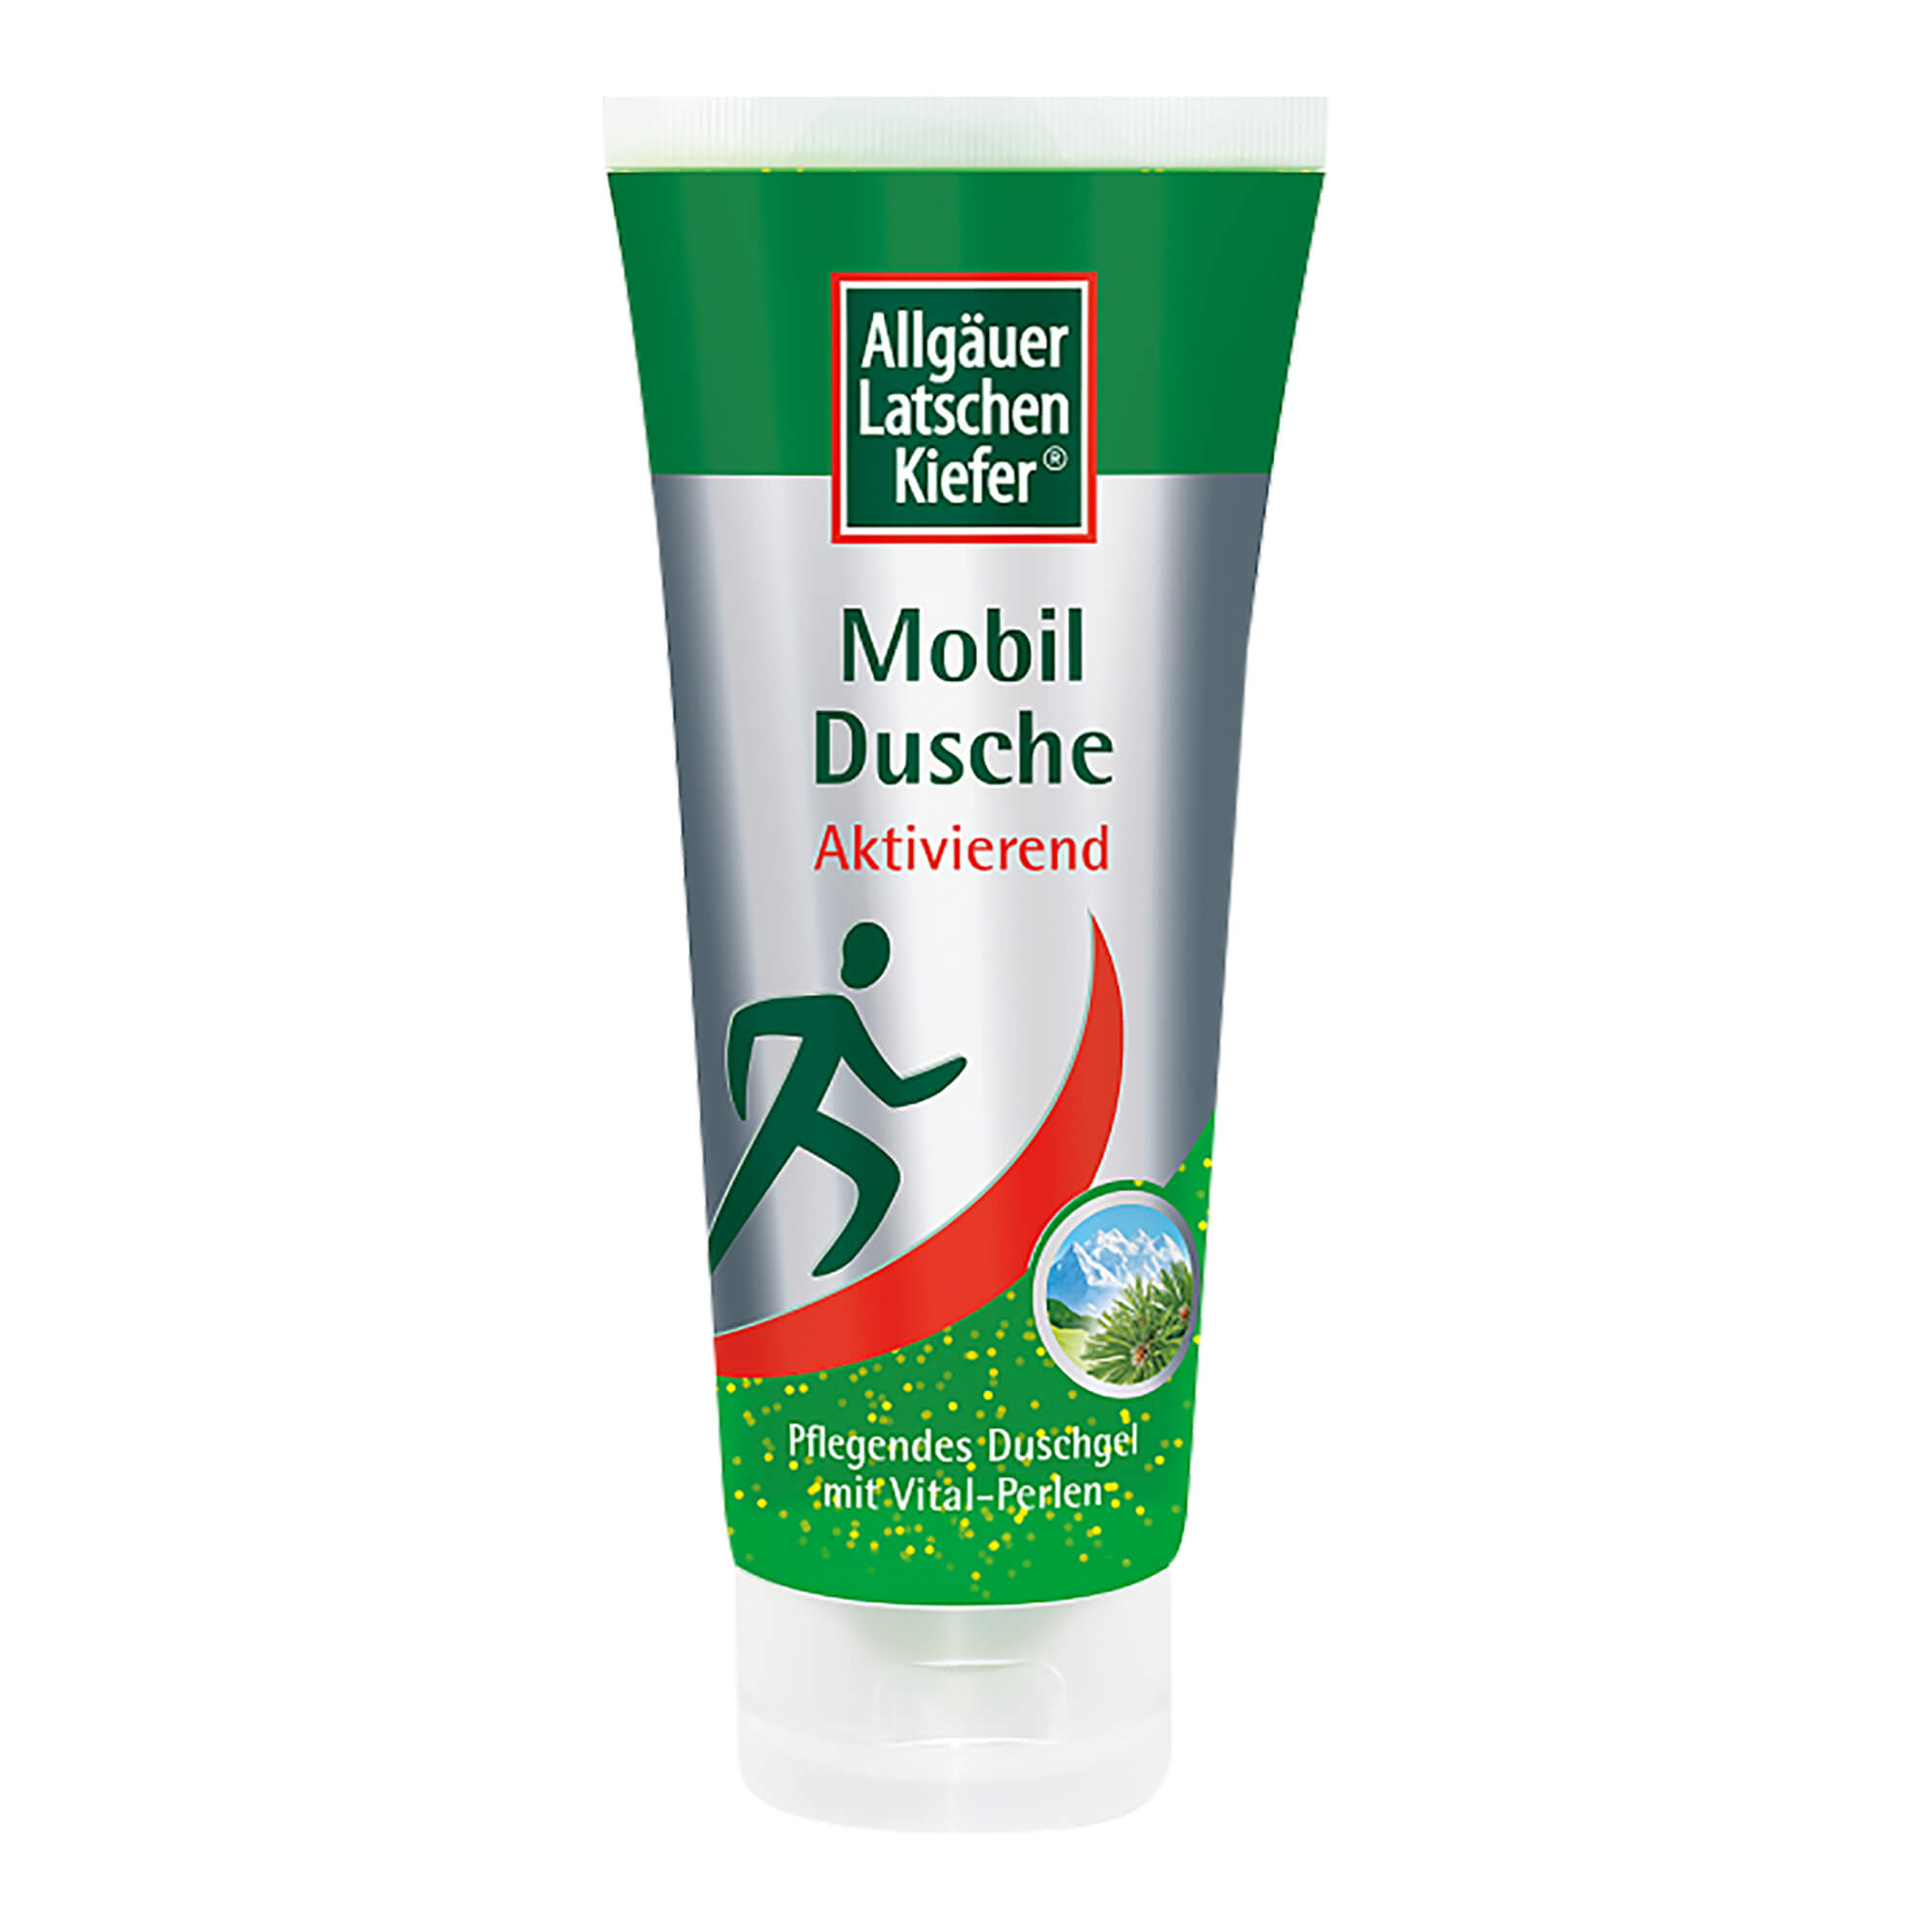 Allgäuer Latschenkiefer Mobil Dusche